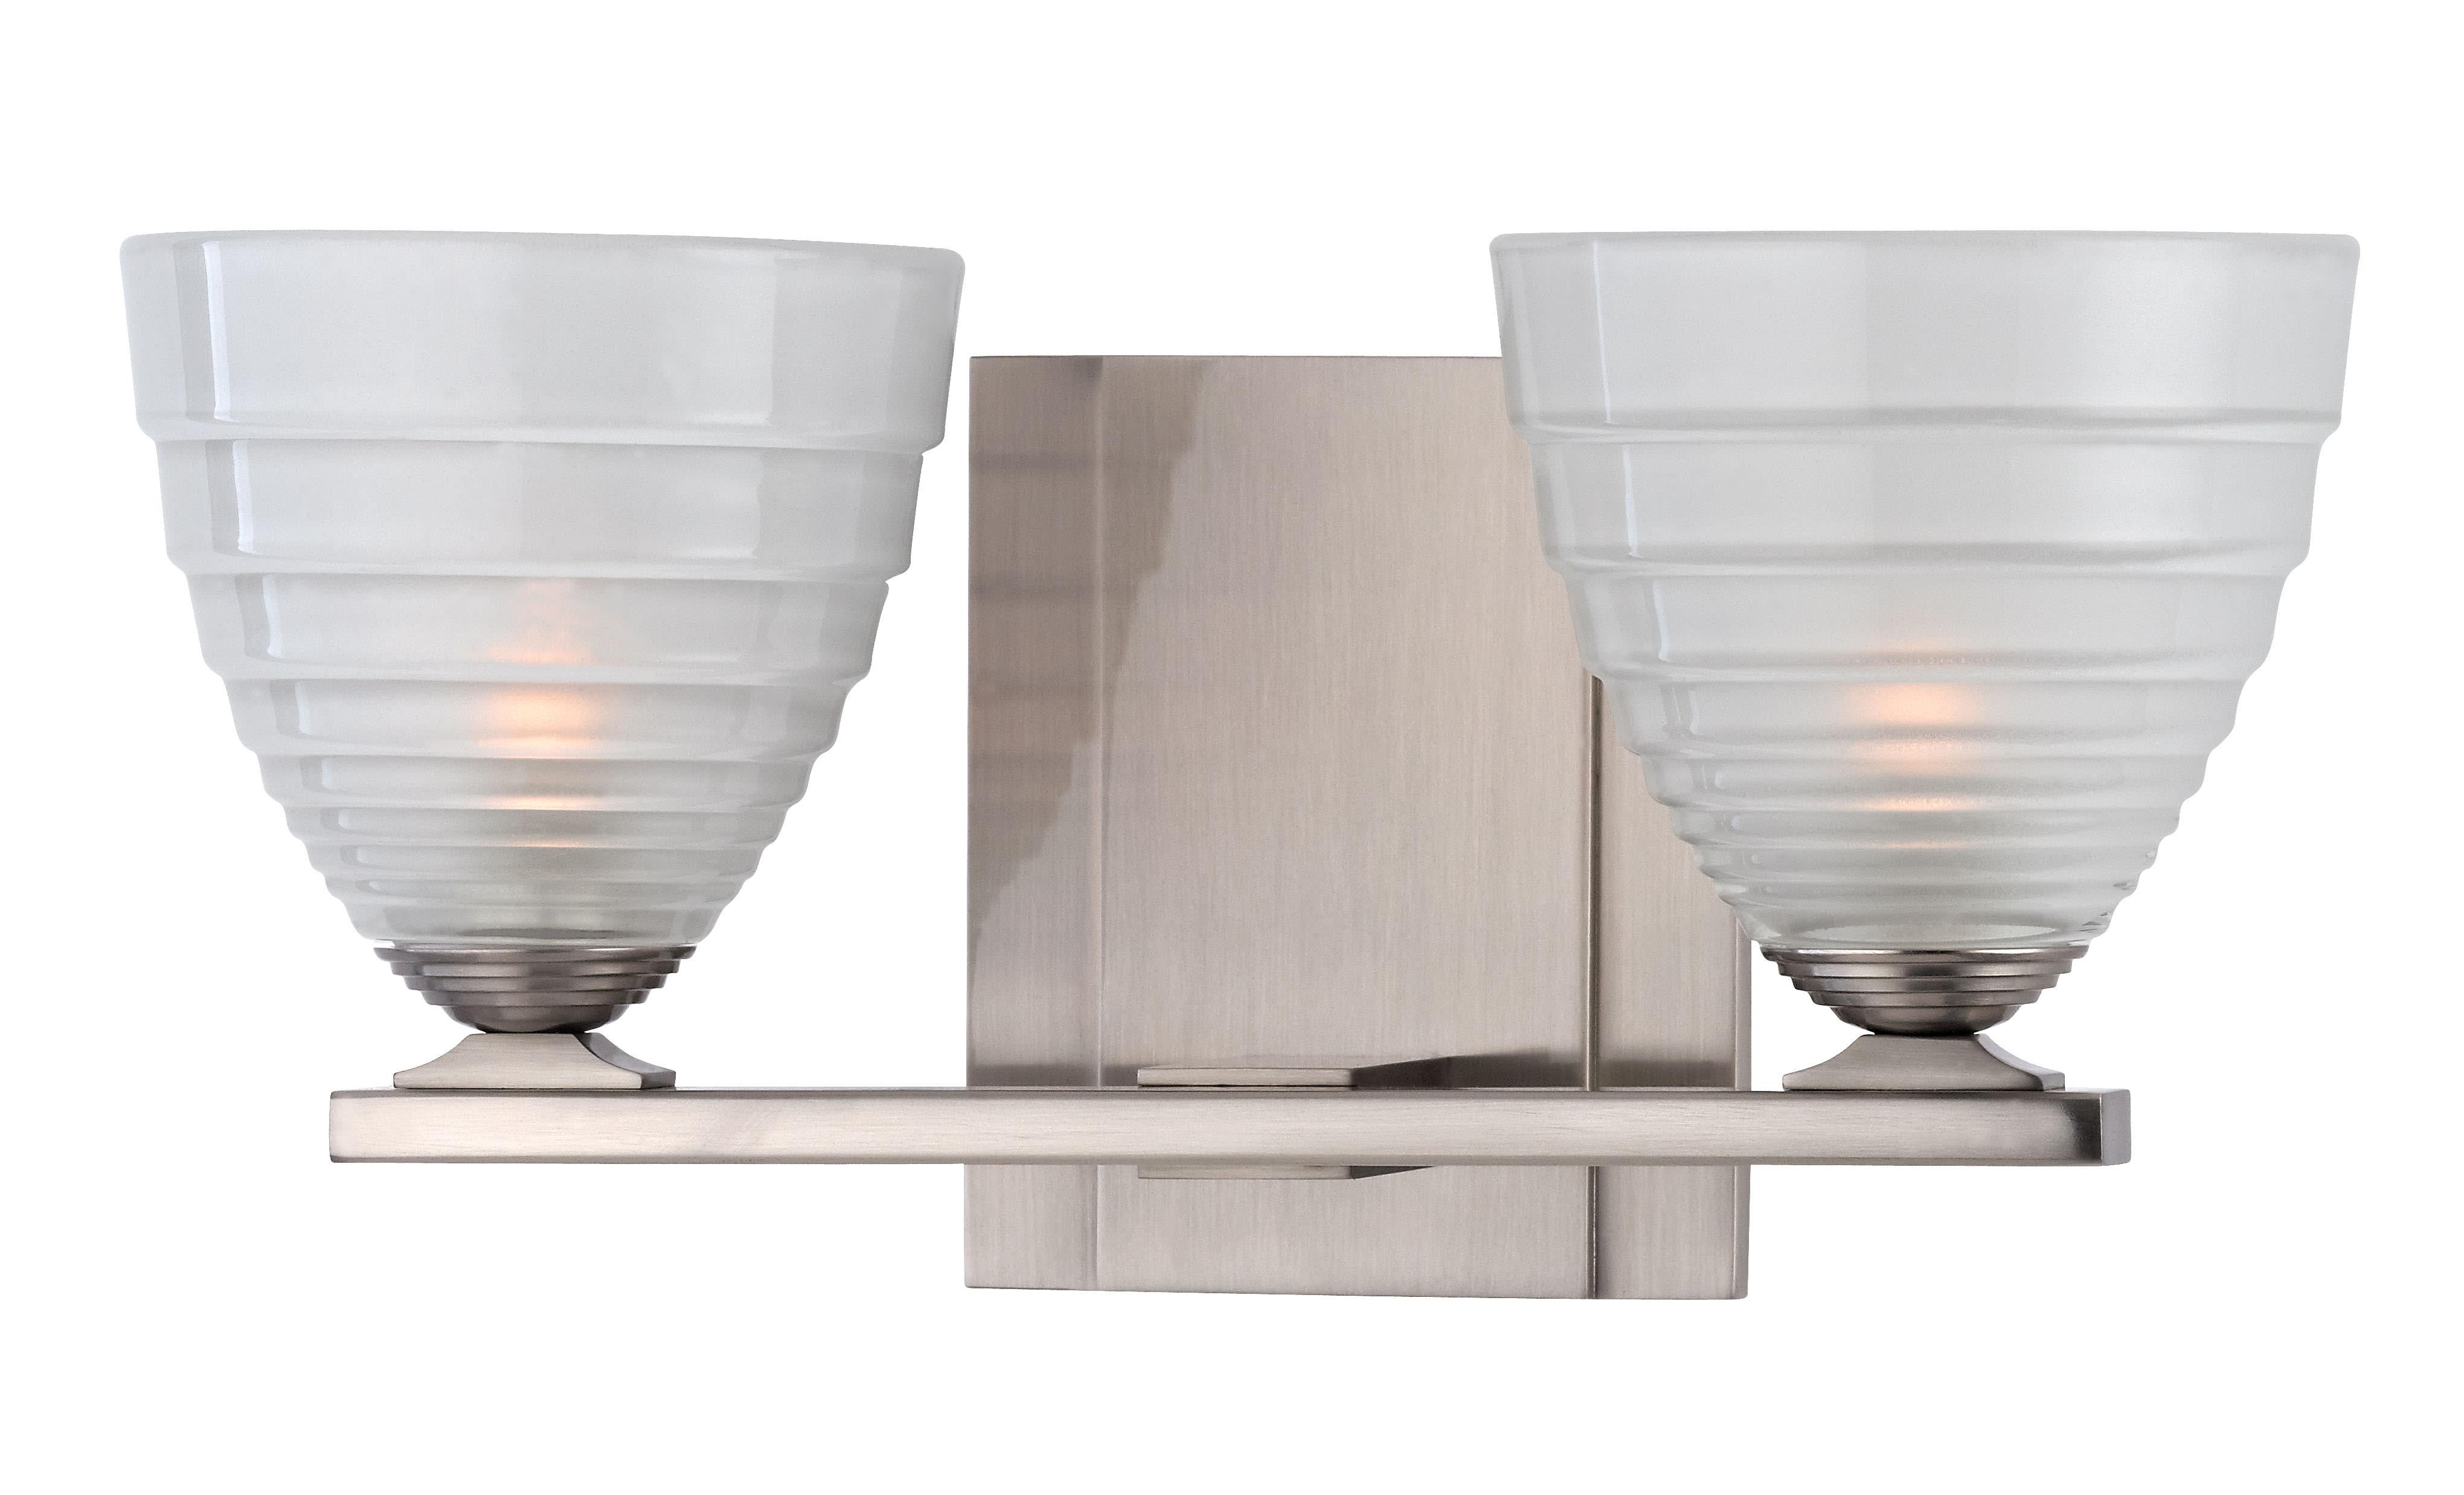 Hudson Valley Lighting 1442 in sizing 4080 X 2475